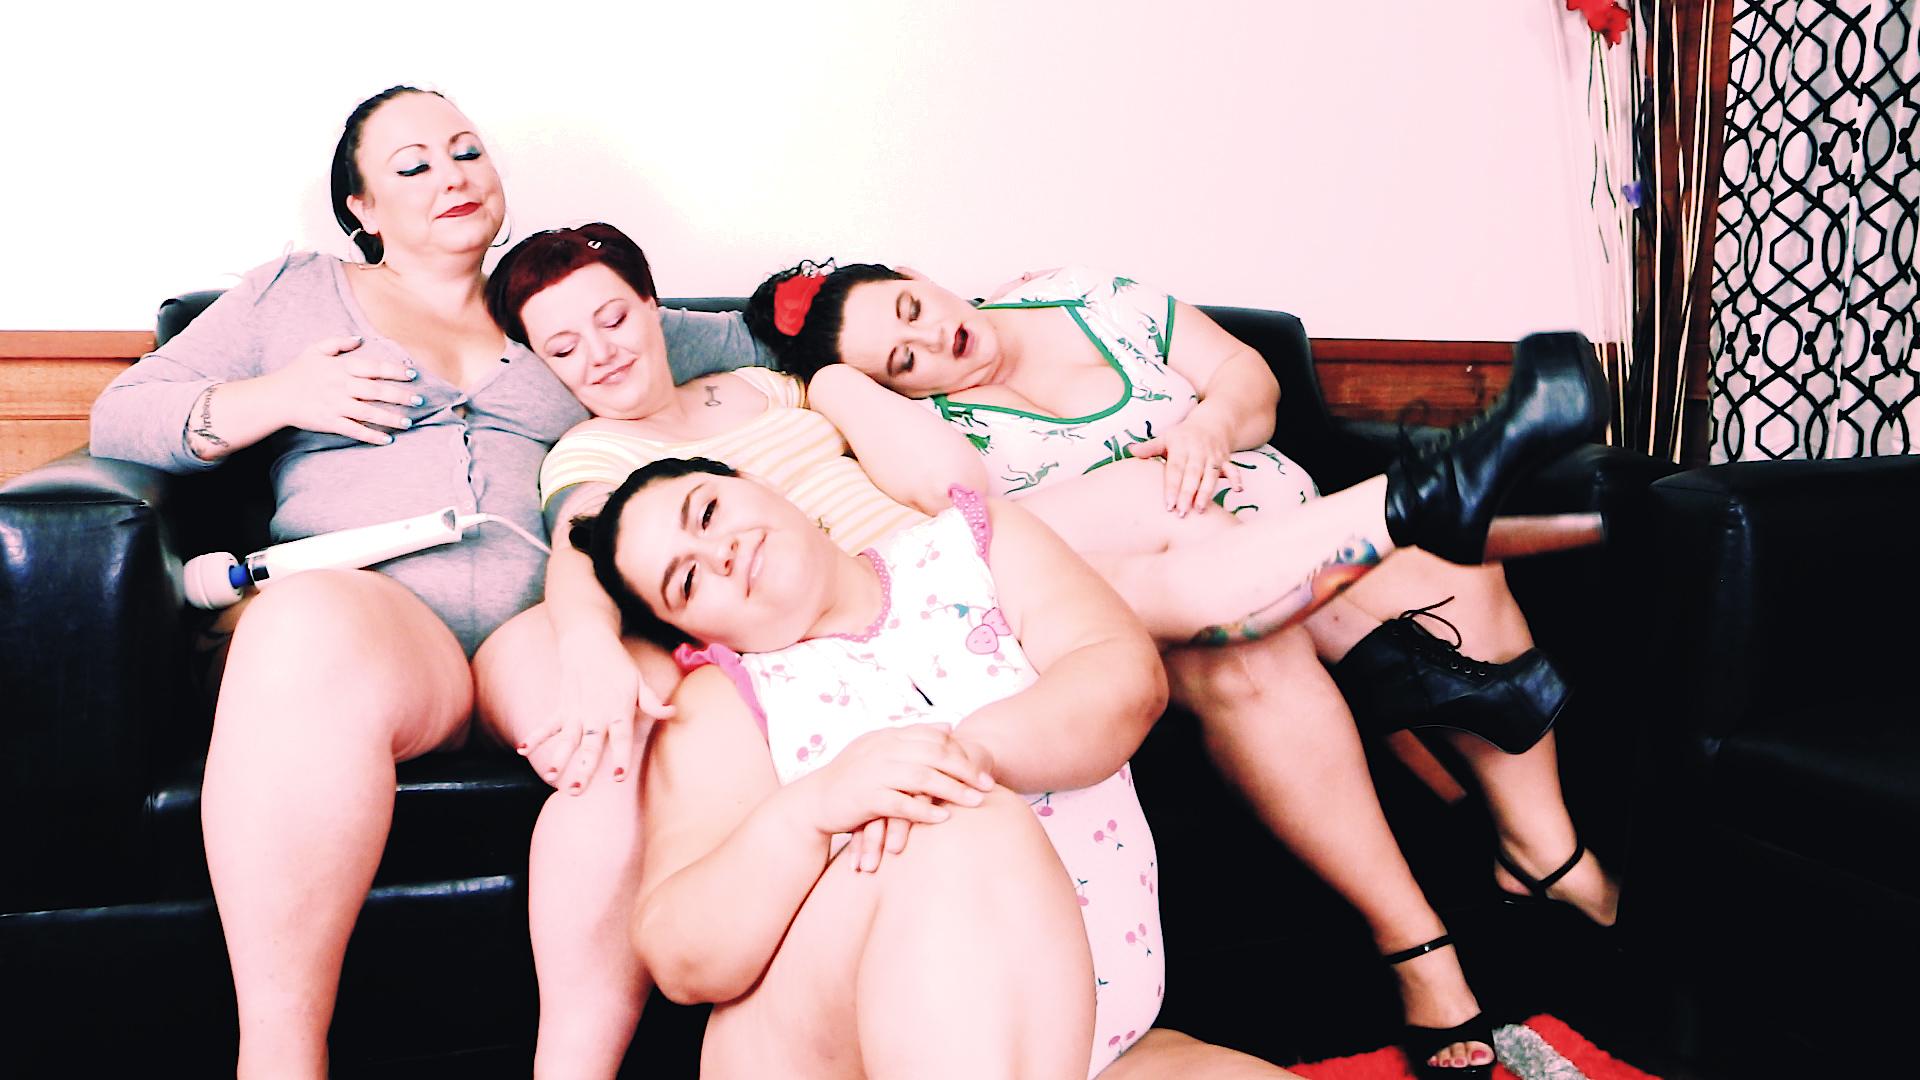 Onsie Orgy: Calista Roxxx, Jessica Lust, Karla Lane, and Trouble